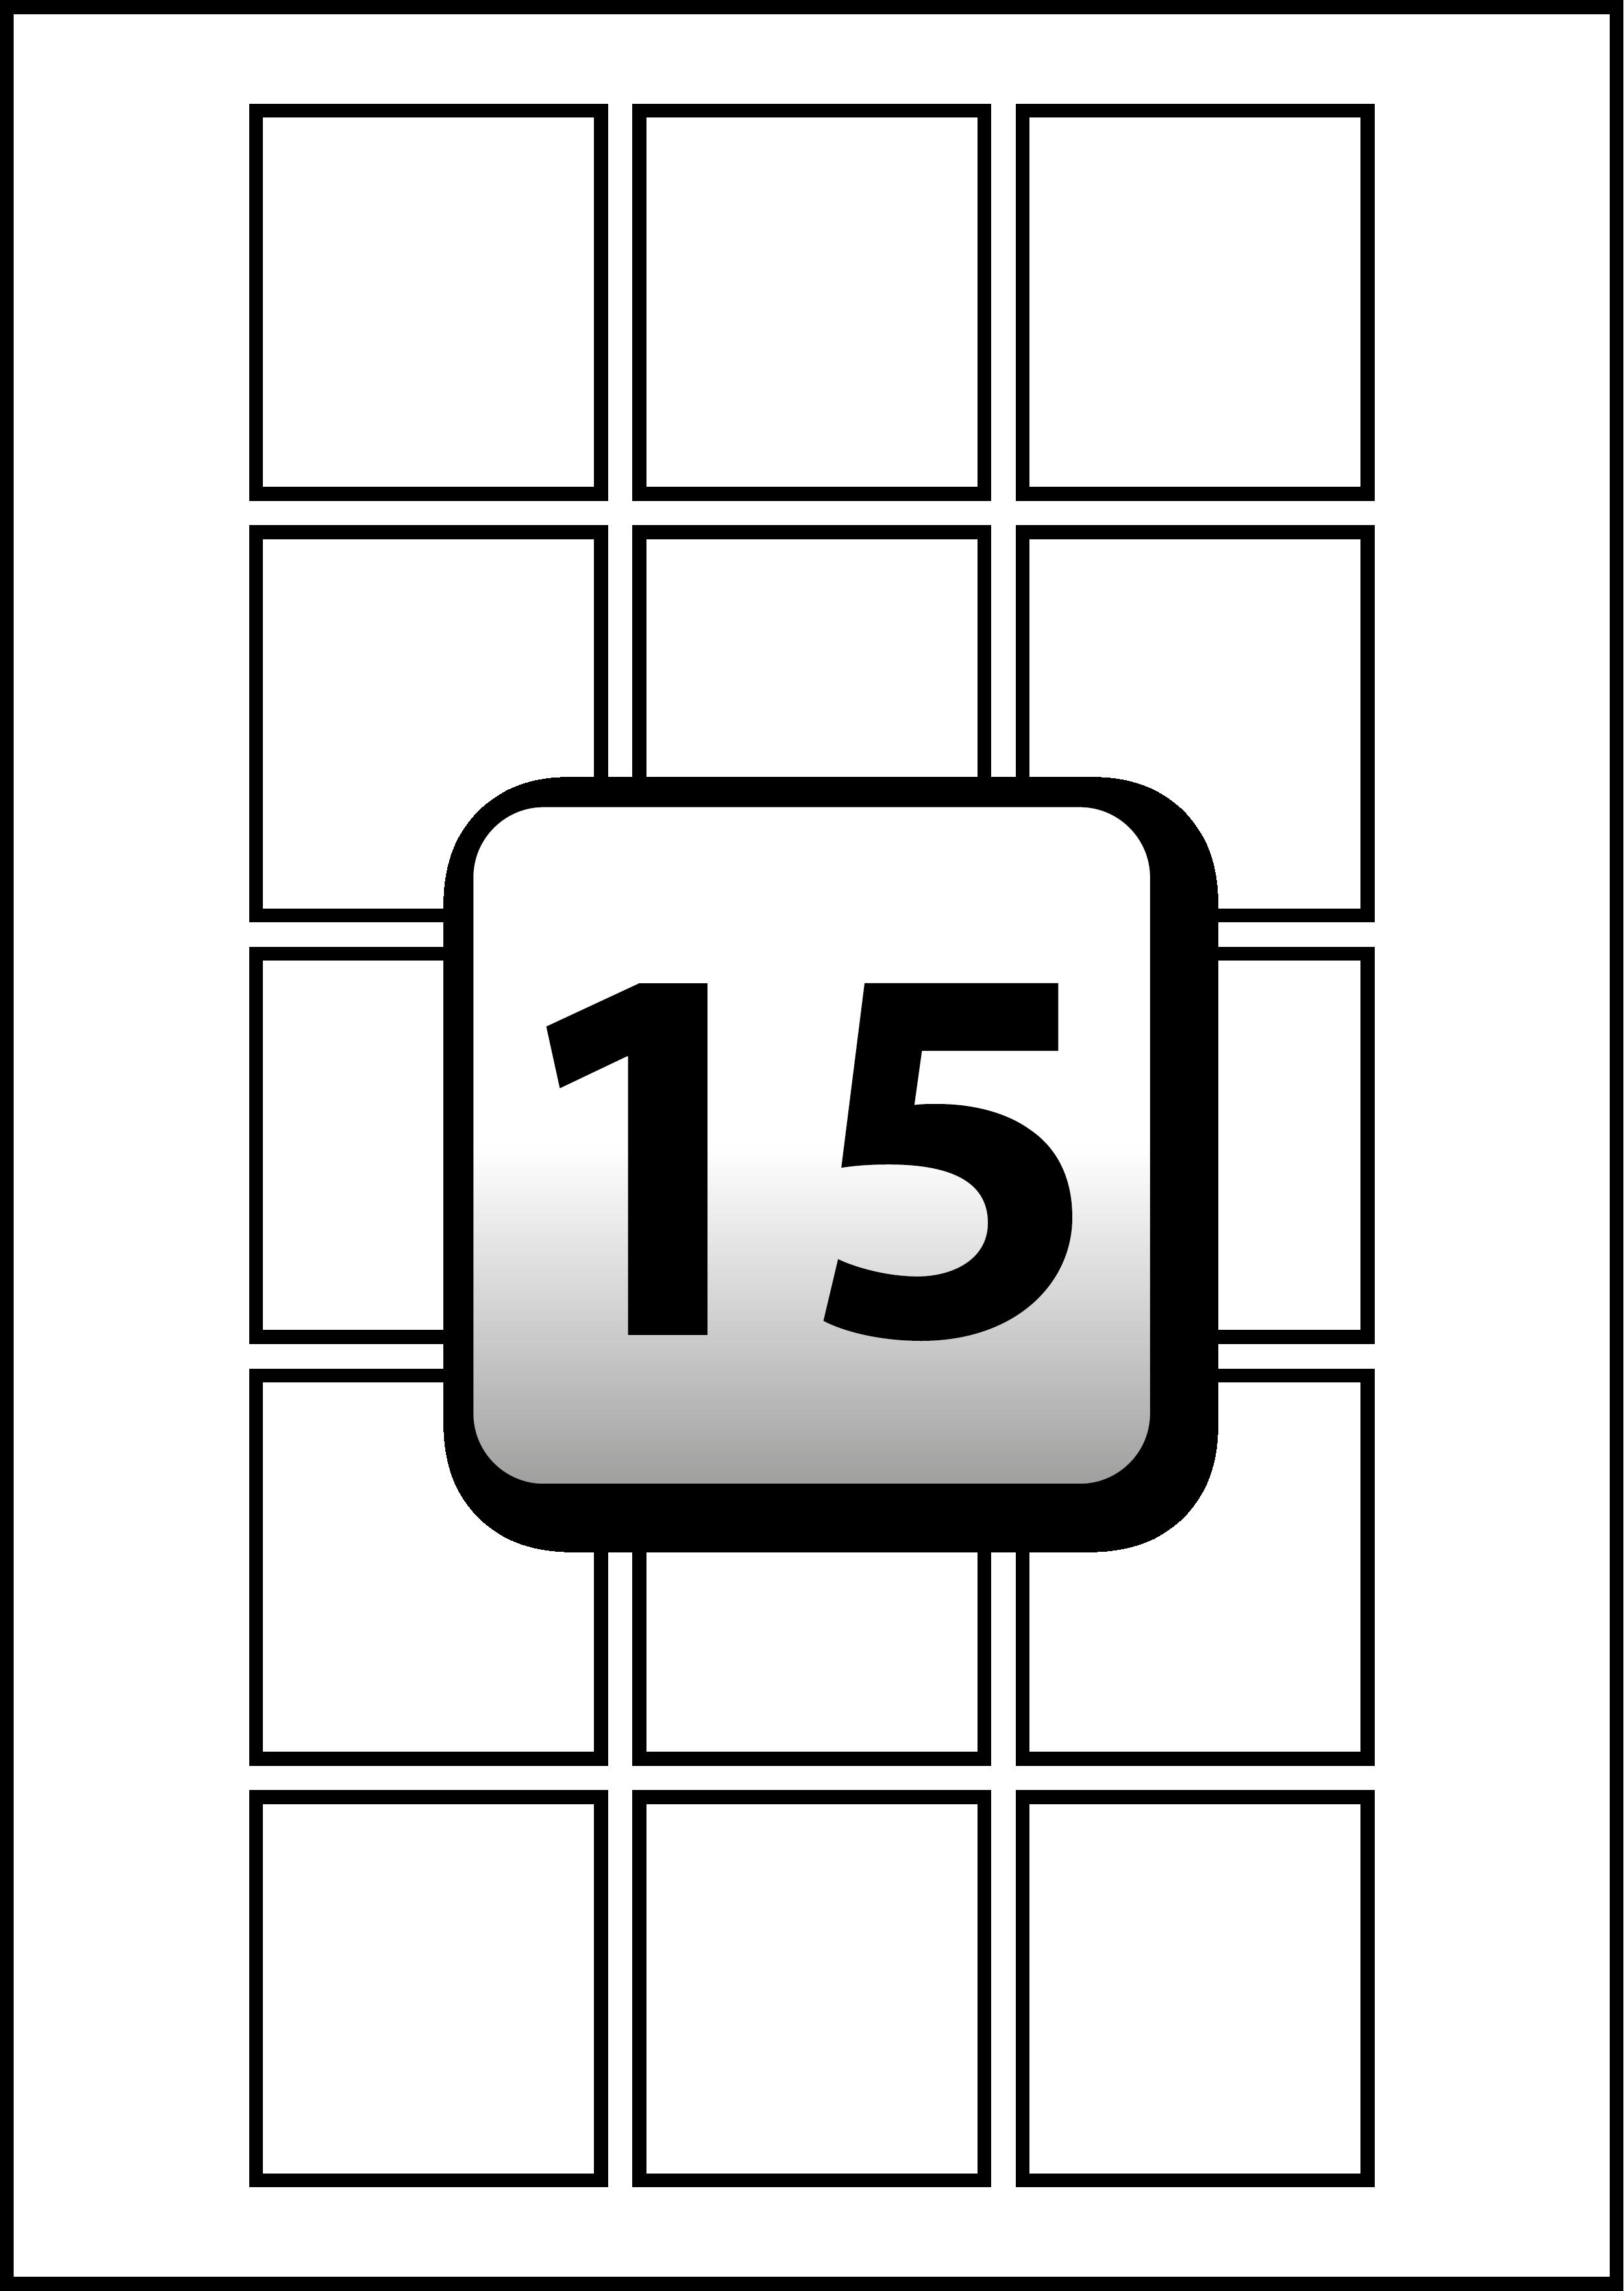 15 address labels per a4 sheet 45 mm x 50 mm